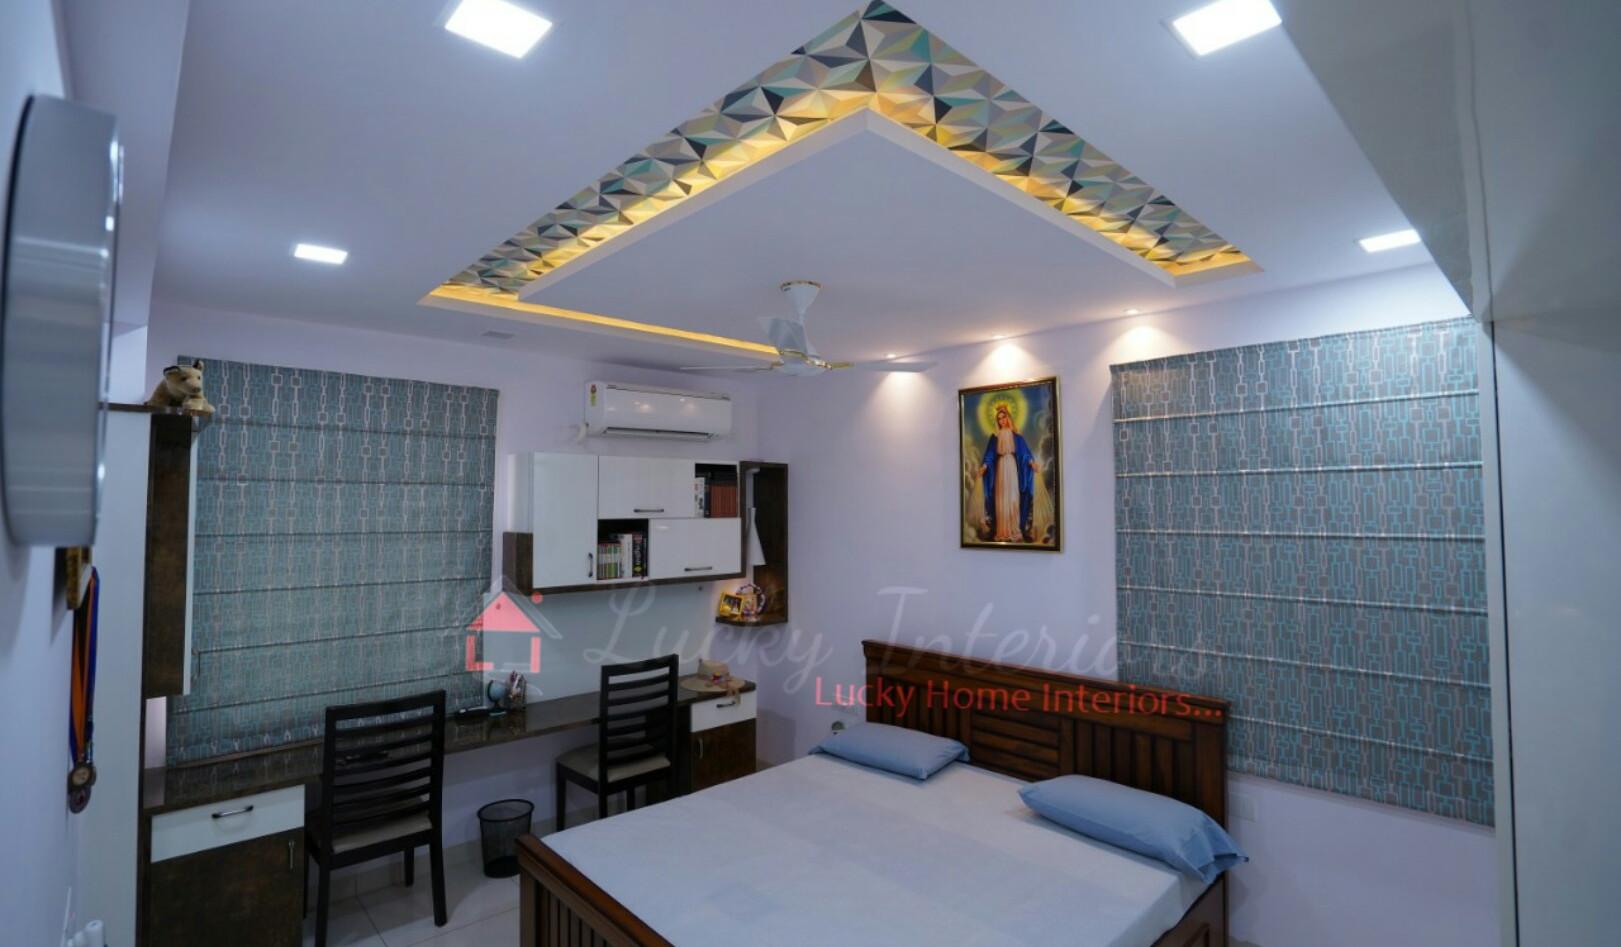 Bedroom Interiors for grownup kids